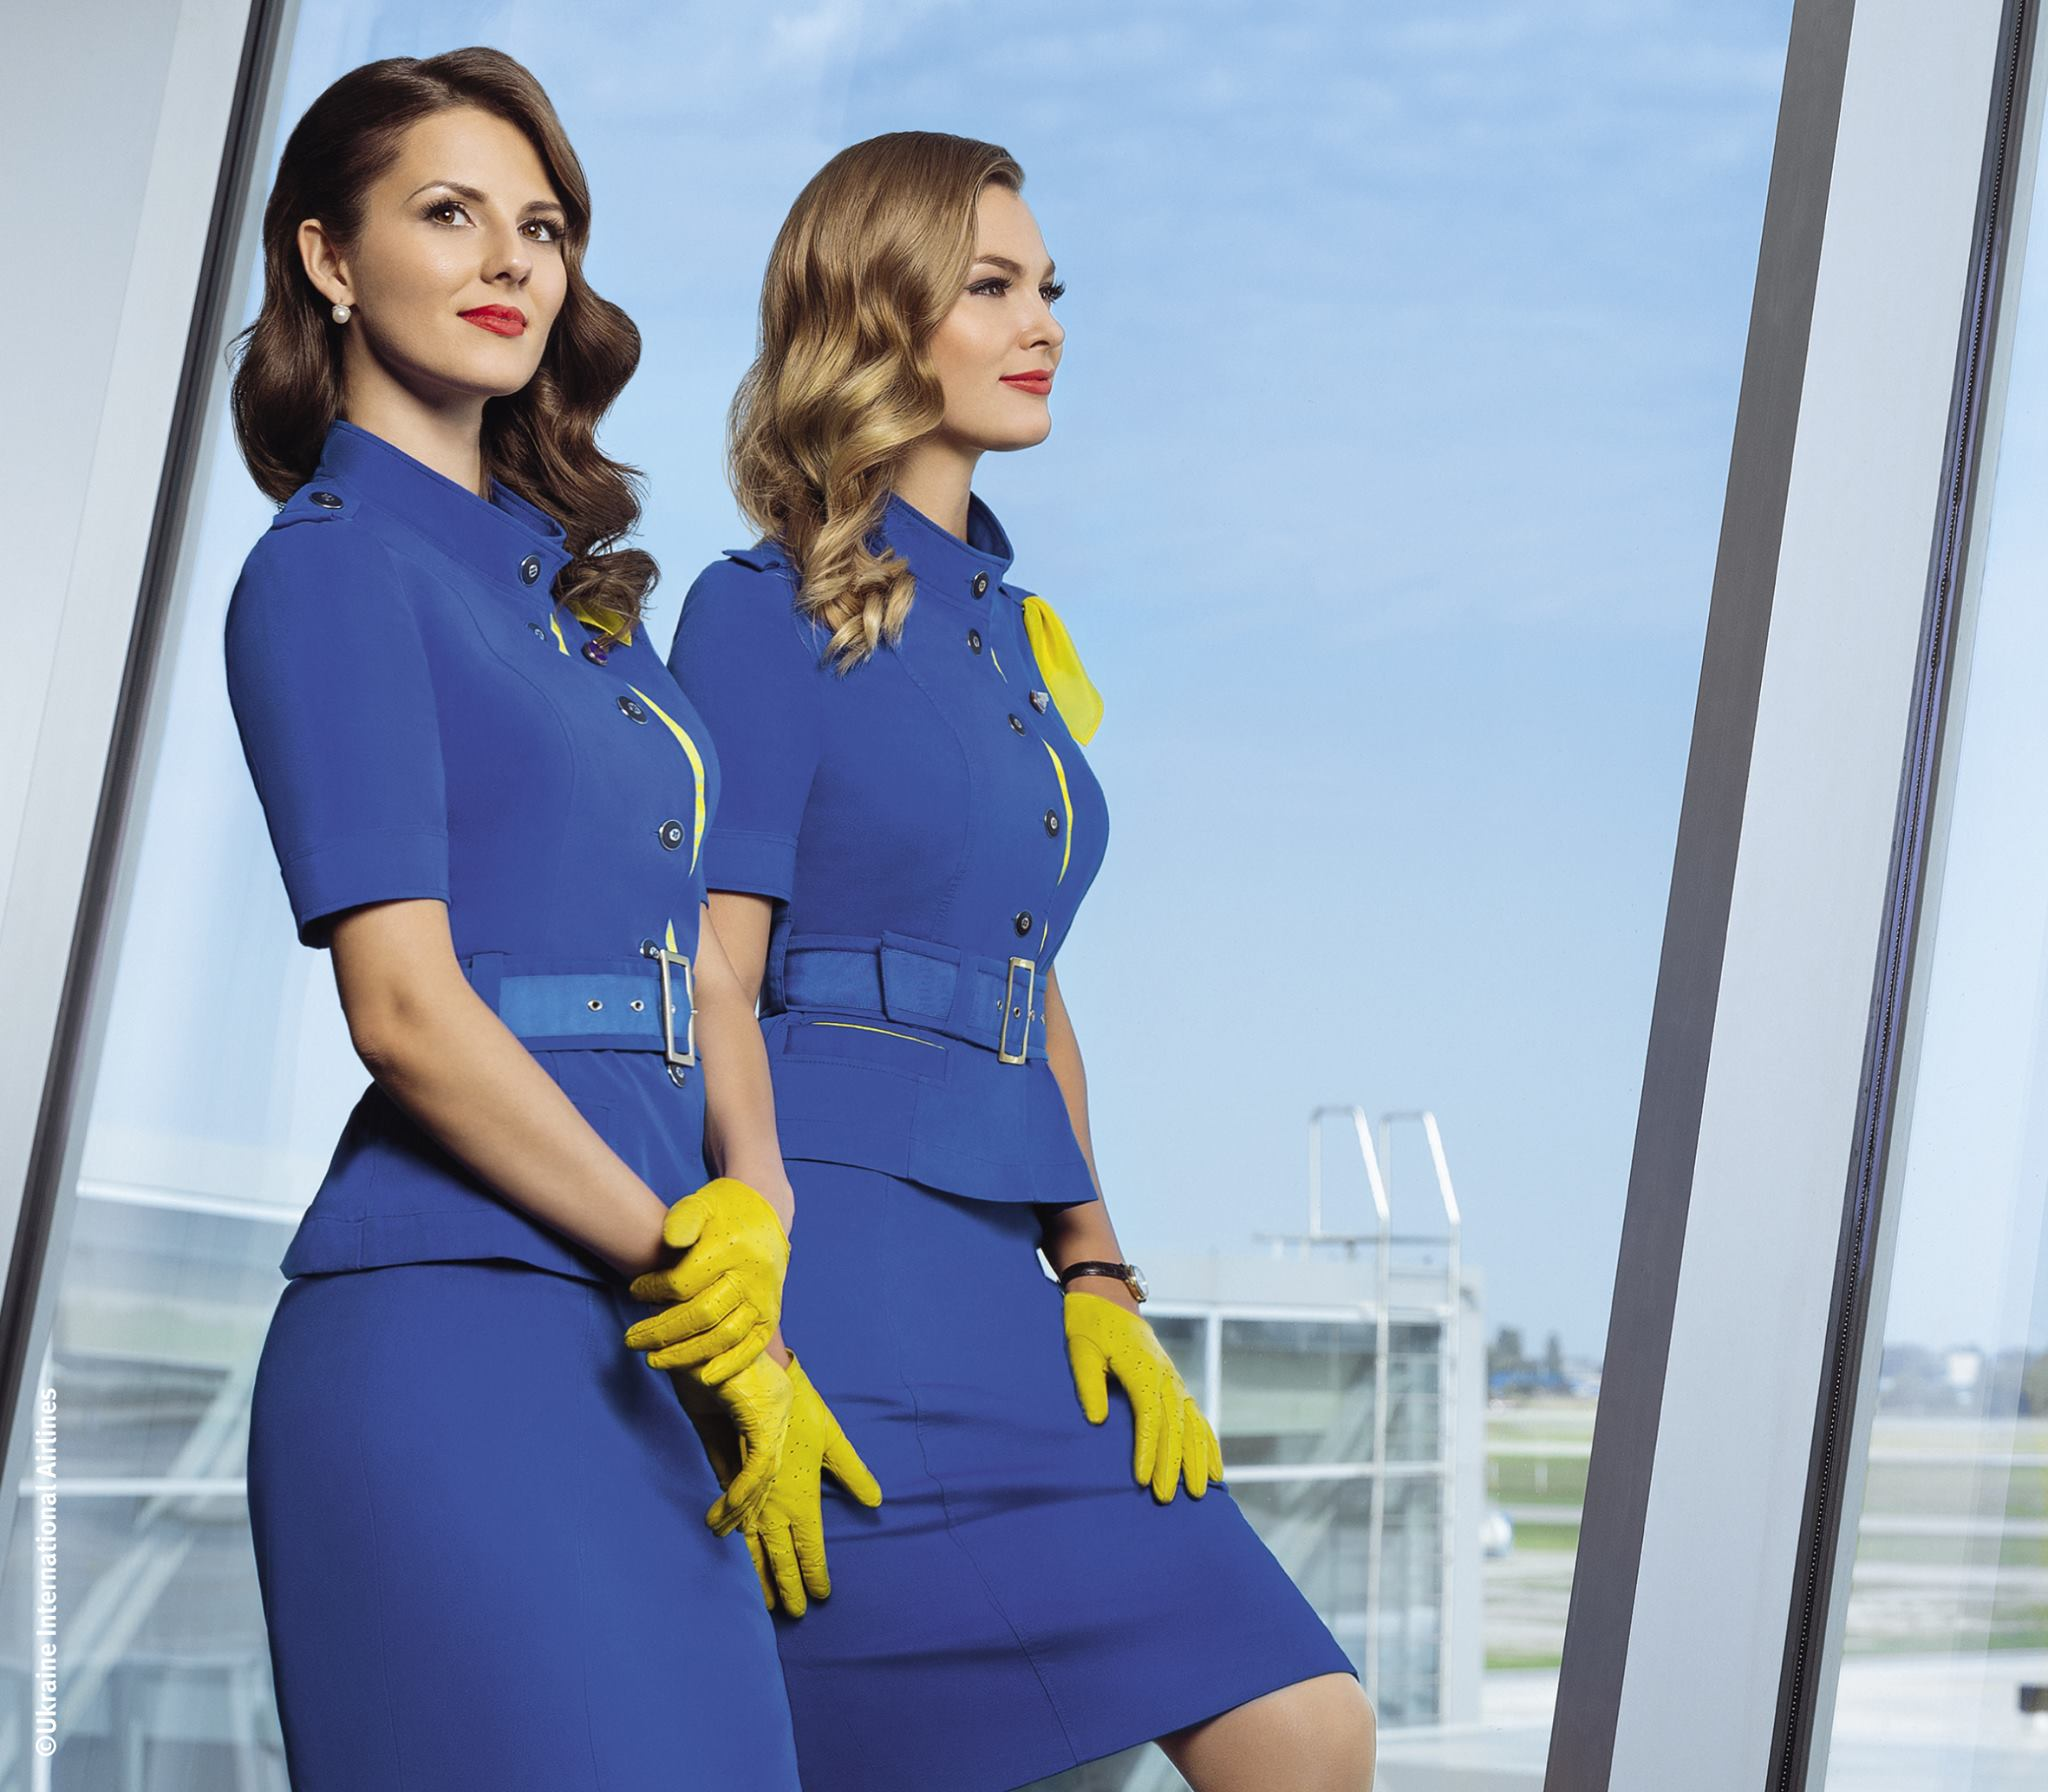 World Airline NewsUkraine International retires its last Boeing 737Classic